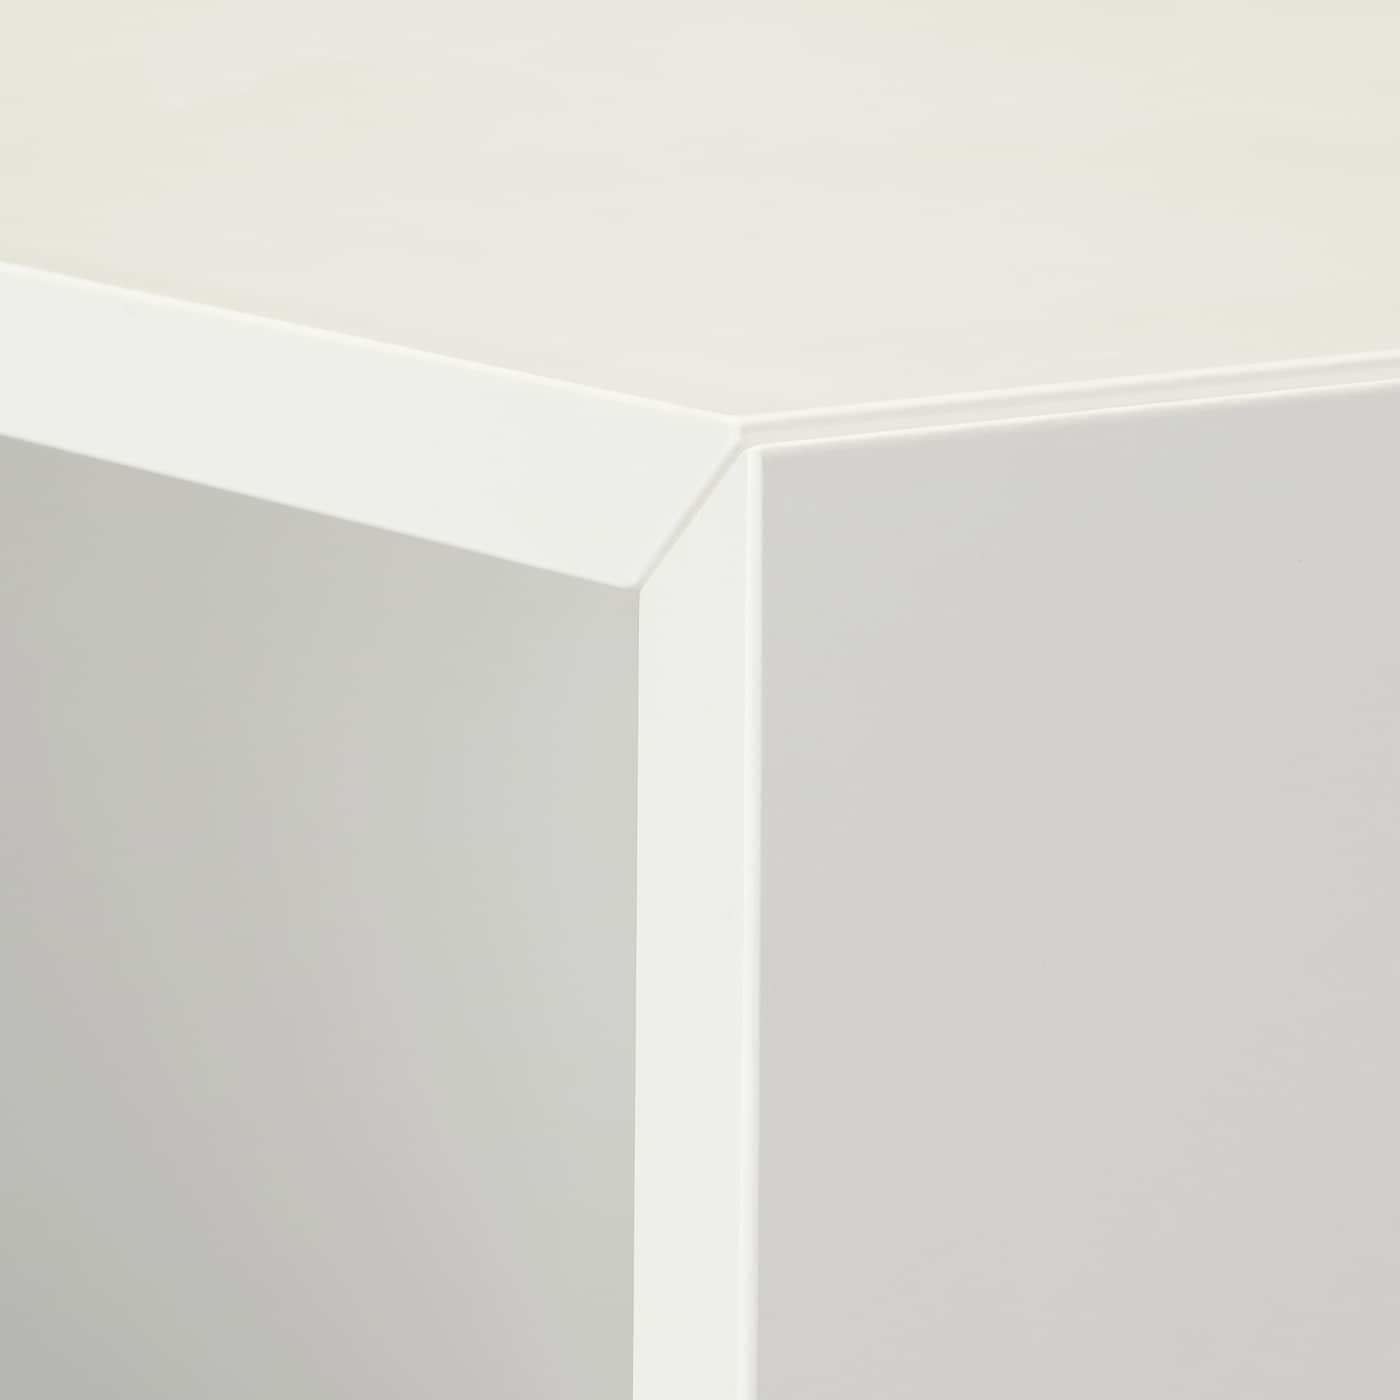 EKET Sestav omaric z nogicami, bela, 35x35x107 cm